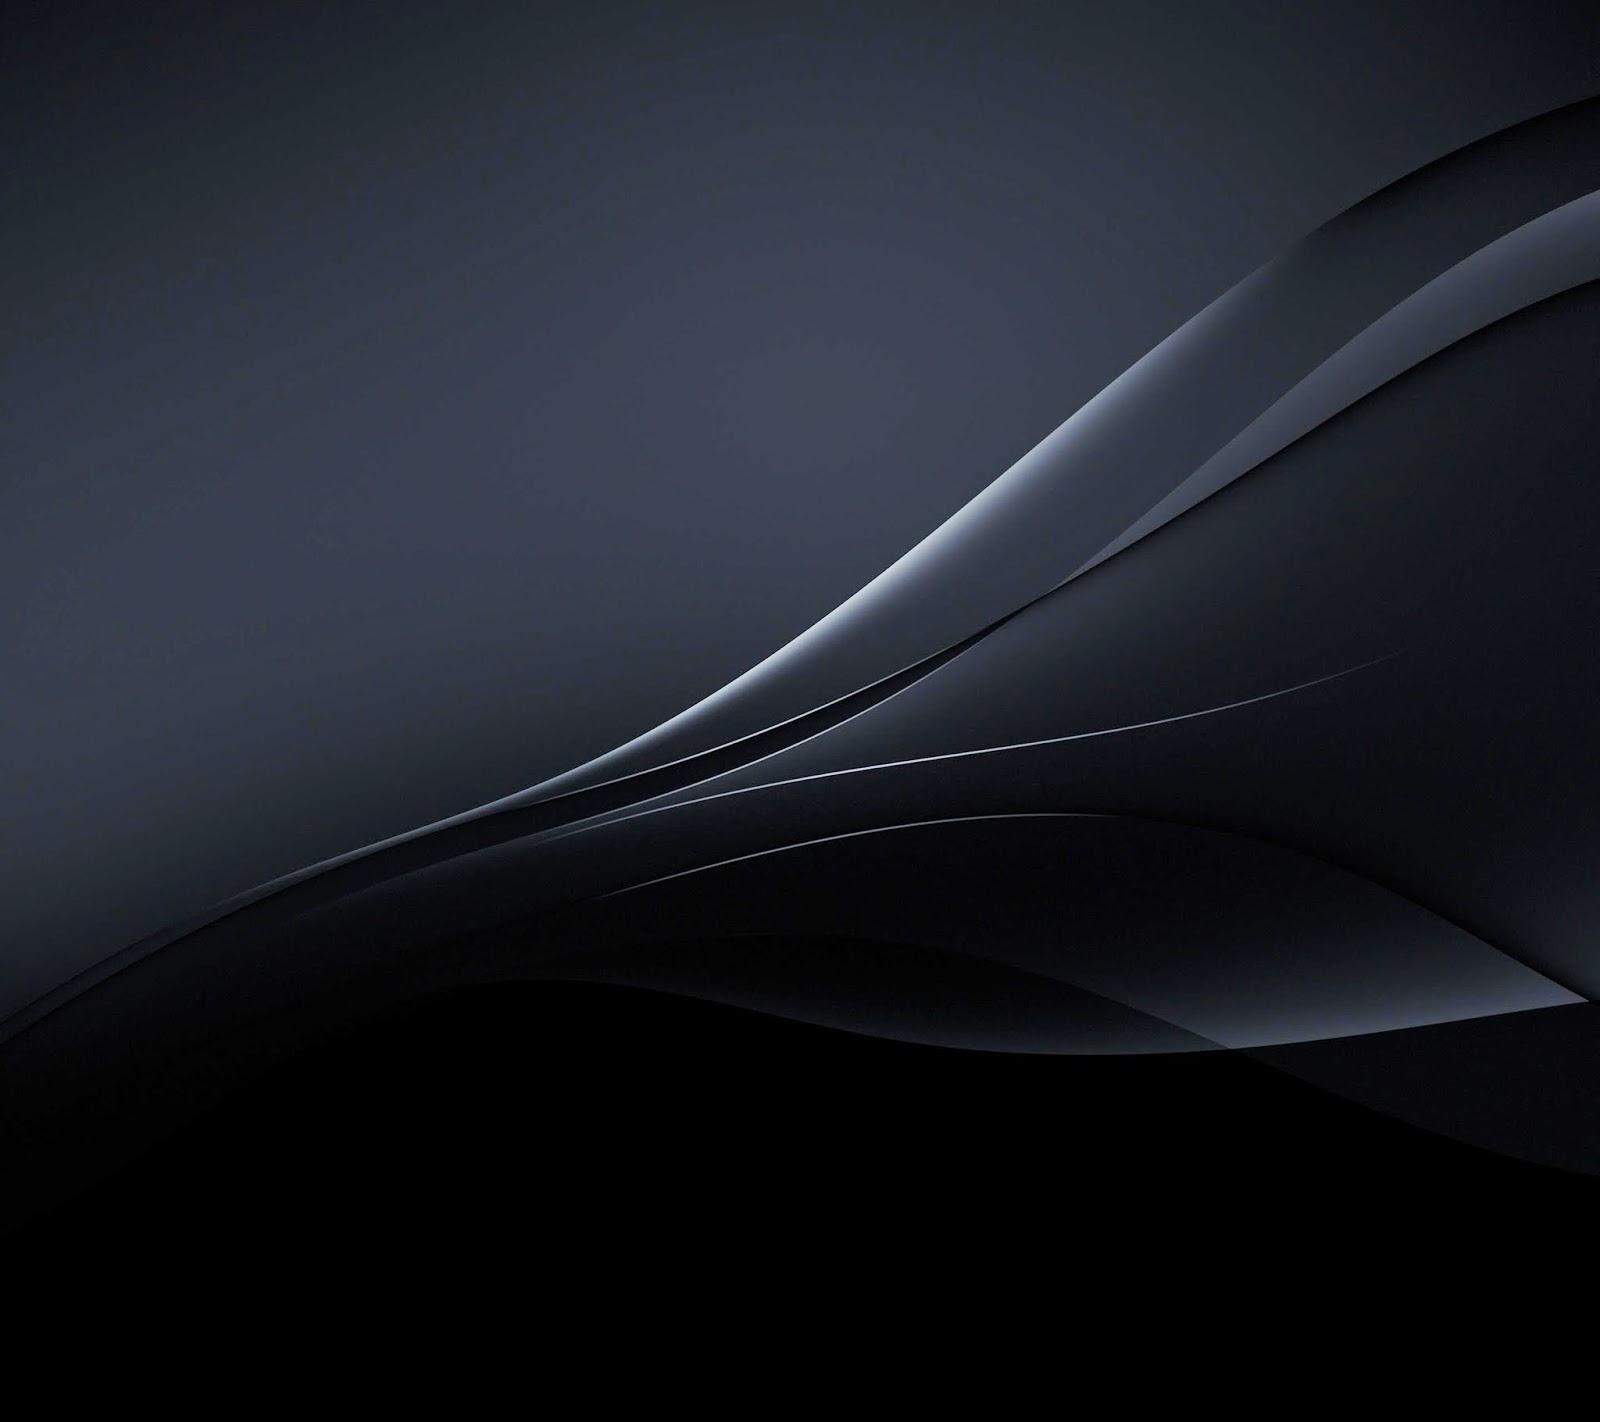 Sony Xperia Z4 Wallpaper Japão 2